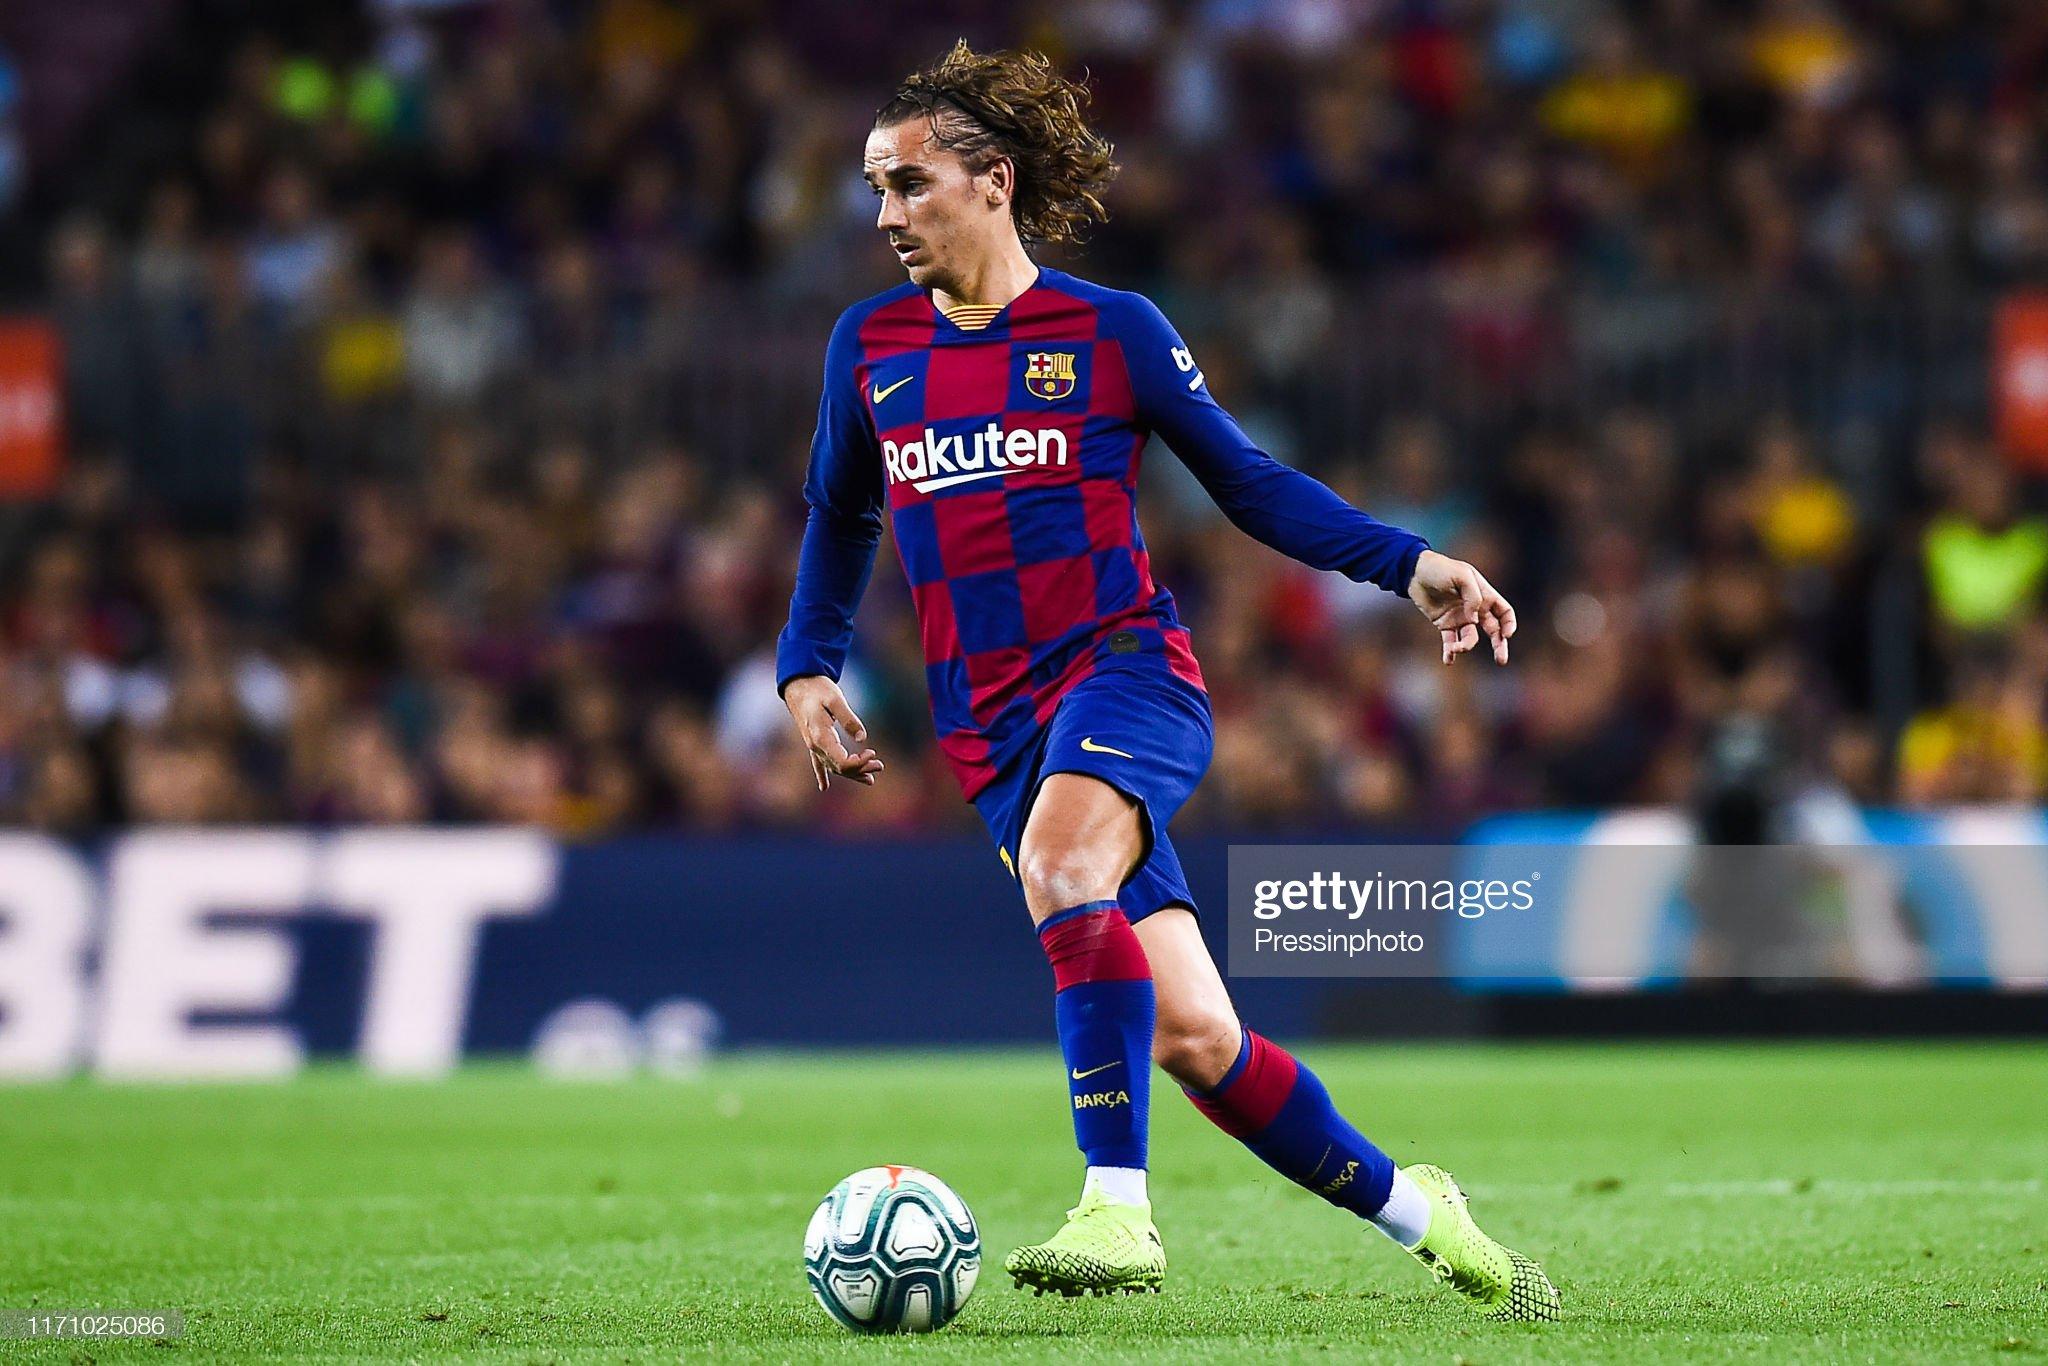 صور مباراة : برشلونة - فياريال 2-1 ( 24-09-2019 )  Antoine-griezmann-of-fc-barcelona-during-the-liga-match-between-and-picture-id1171025086?s=2048x2048